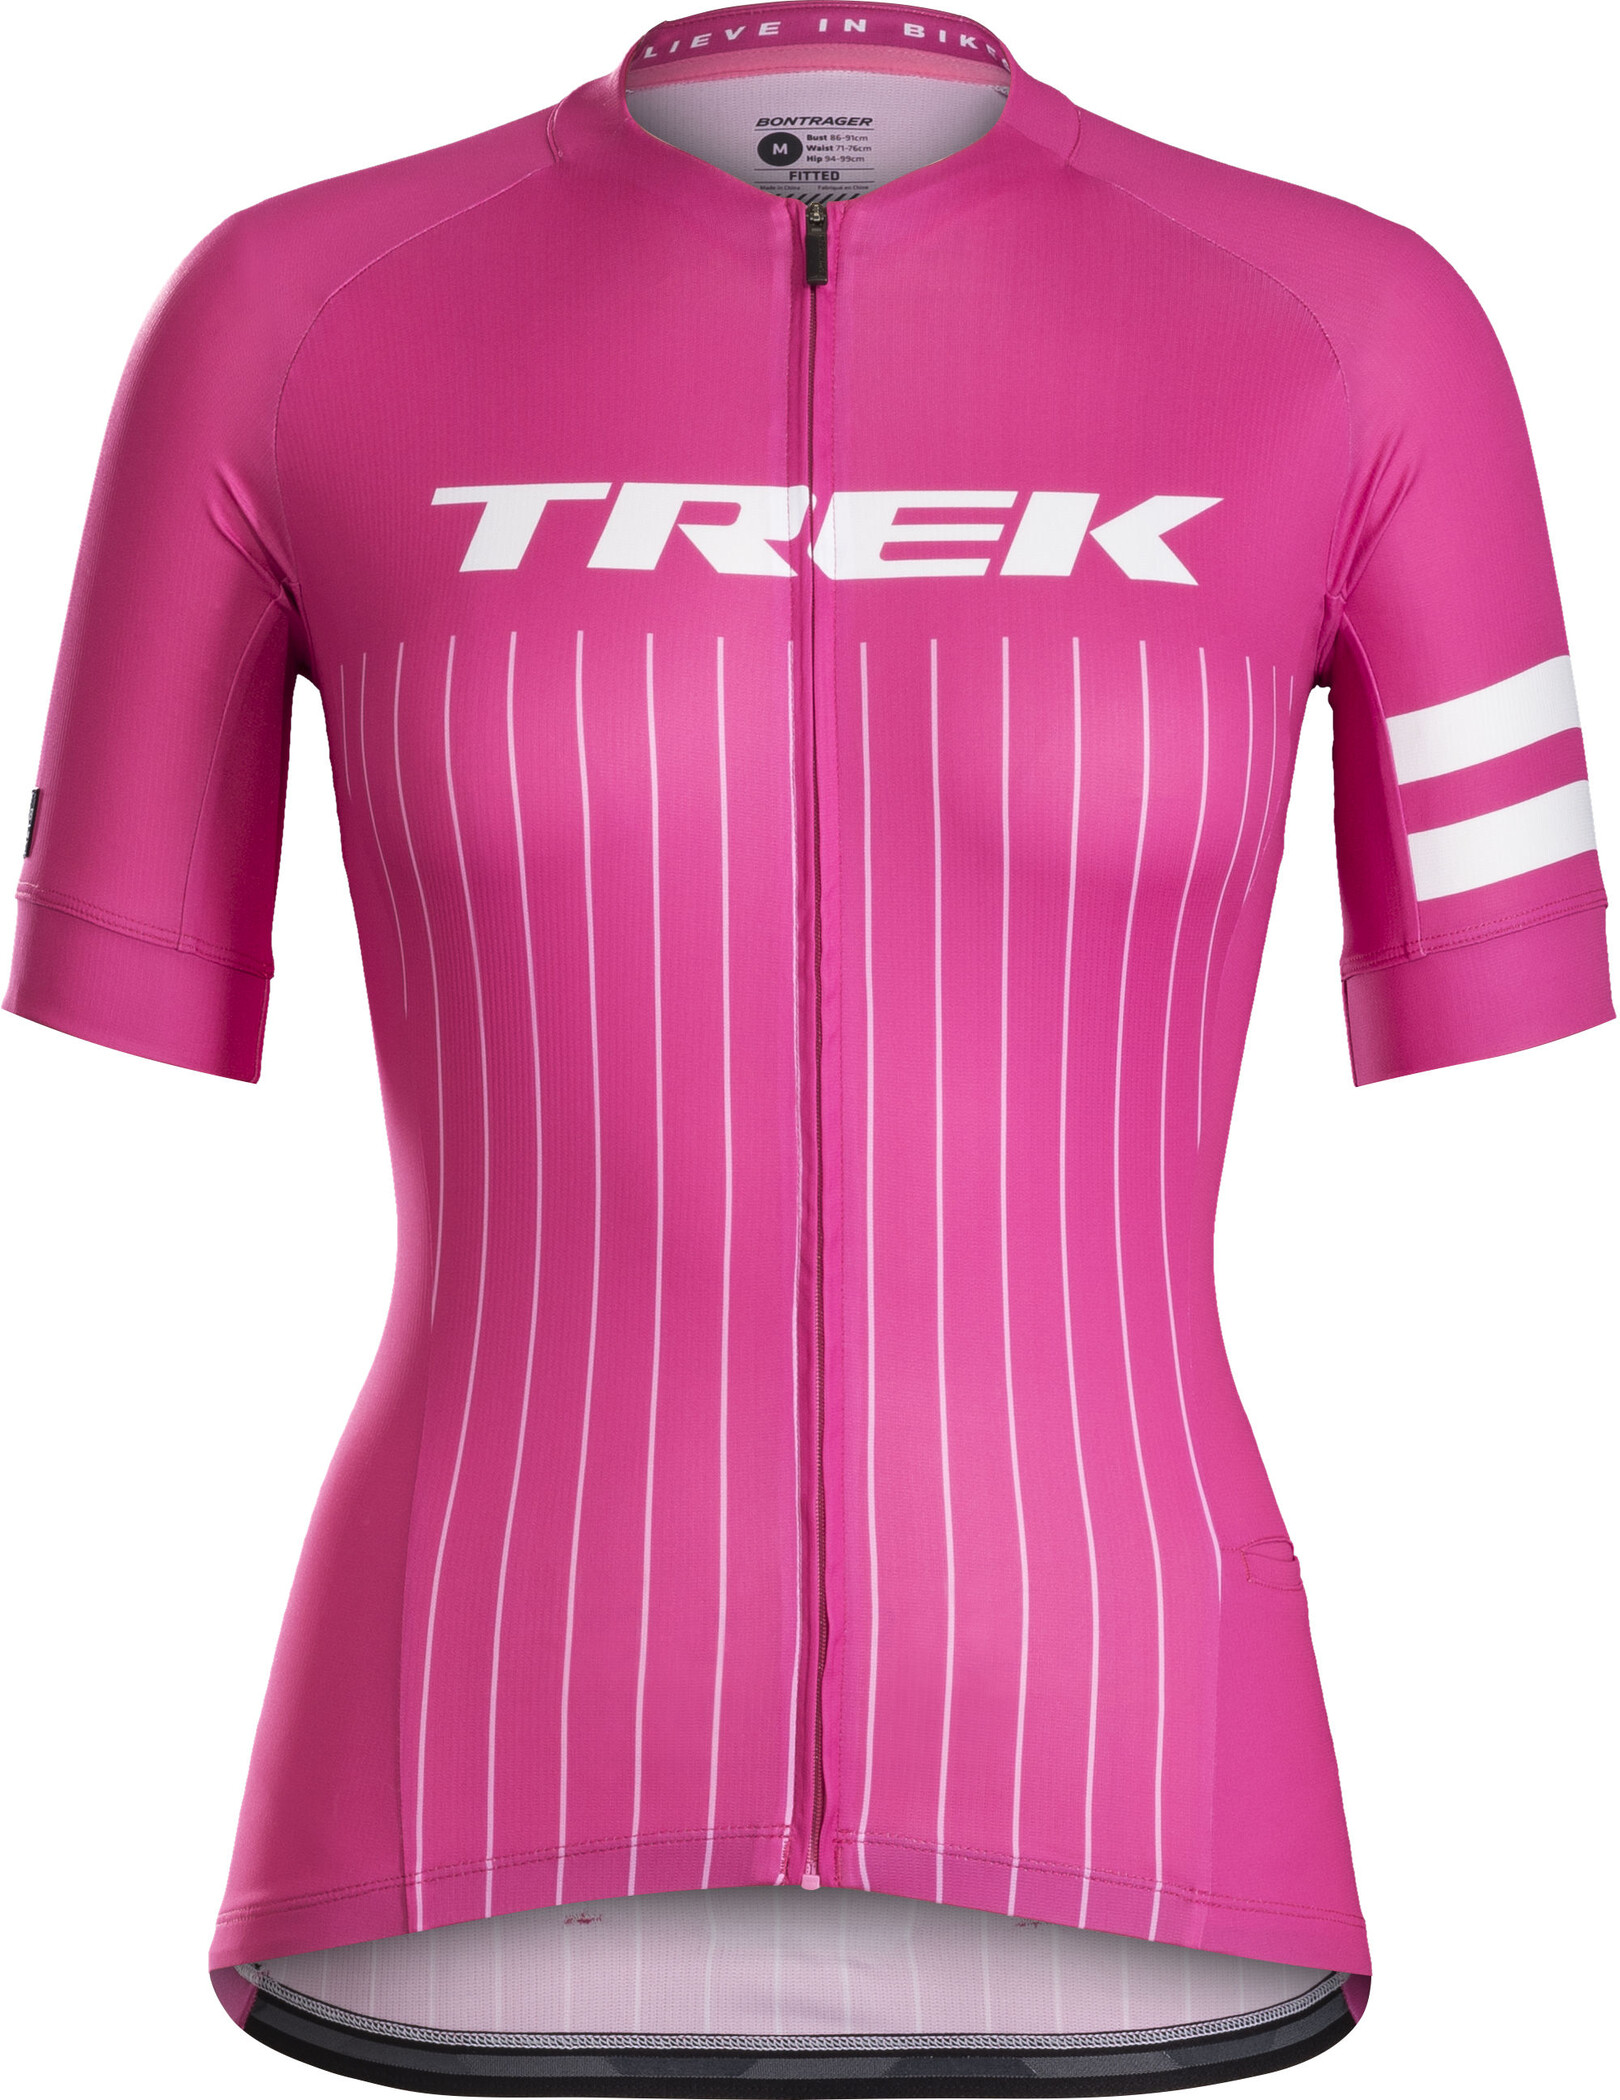 cycling graphics prr star ss jersey men